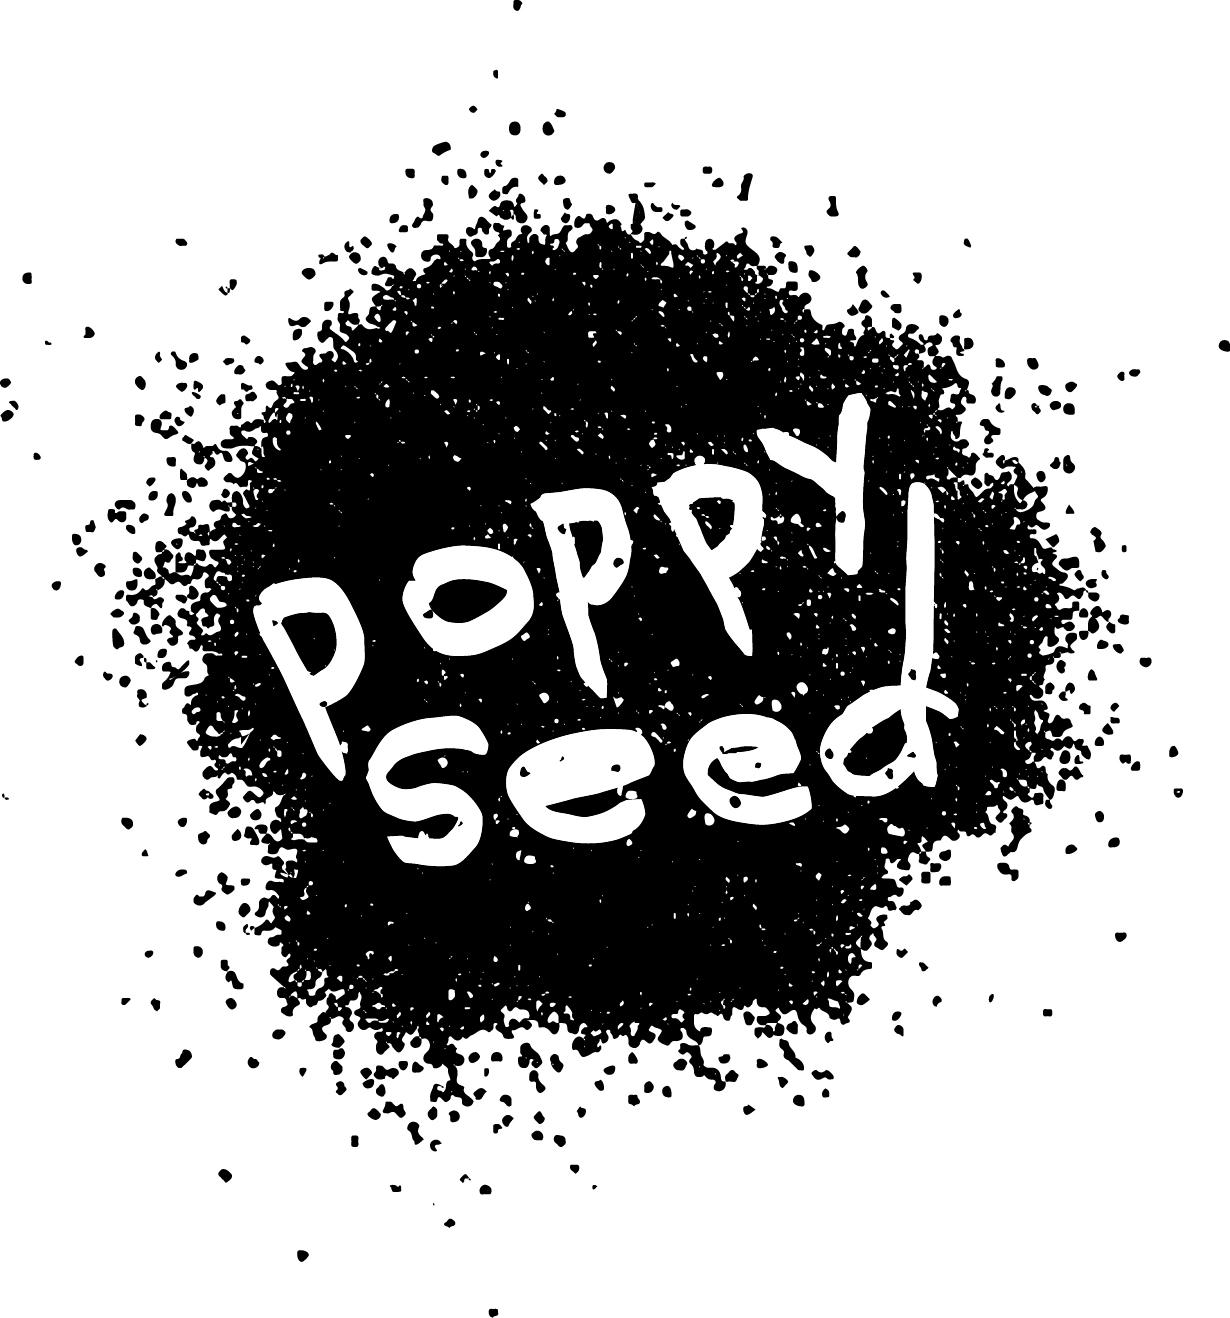 poppy_seed_identity_final [Converted]-1.jpg